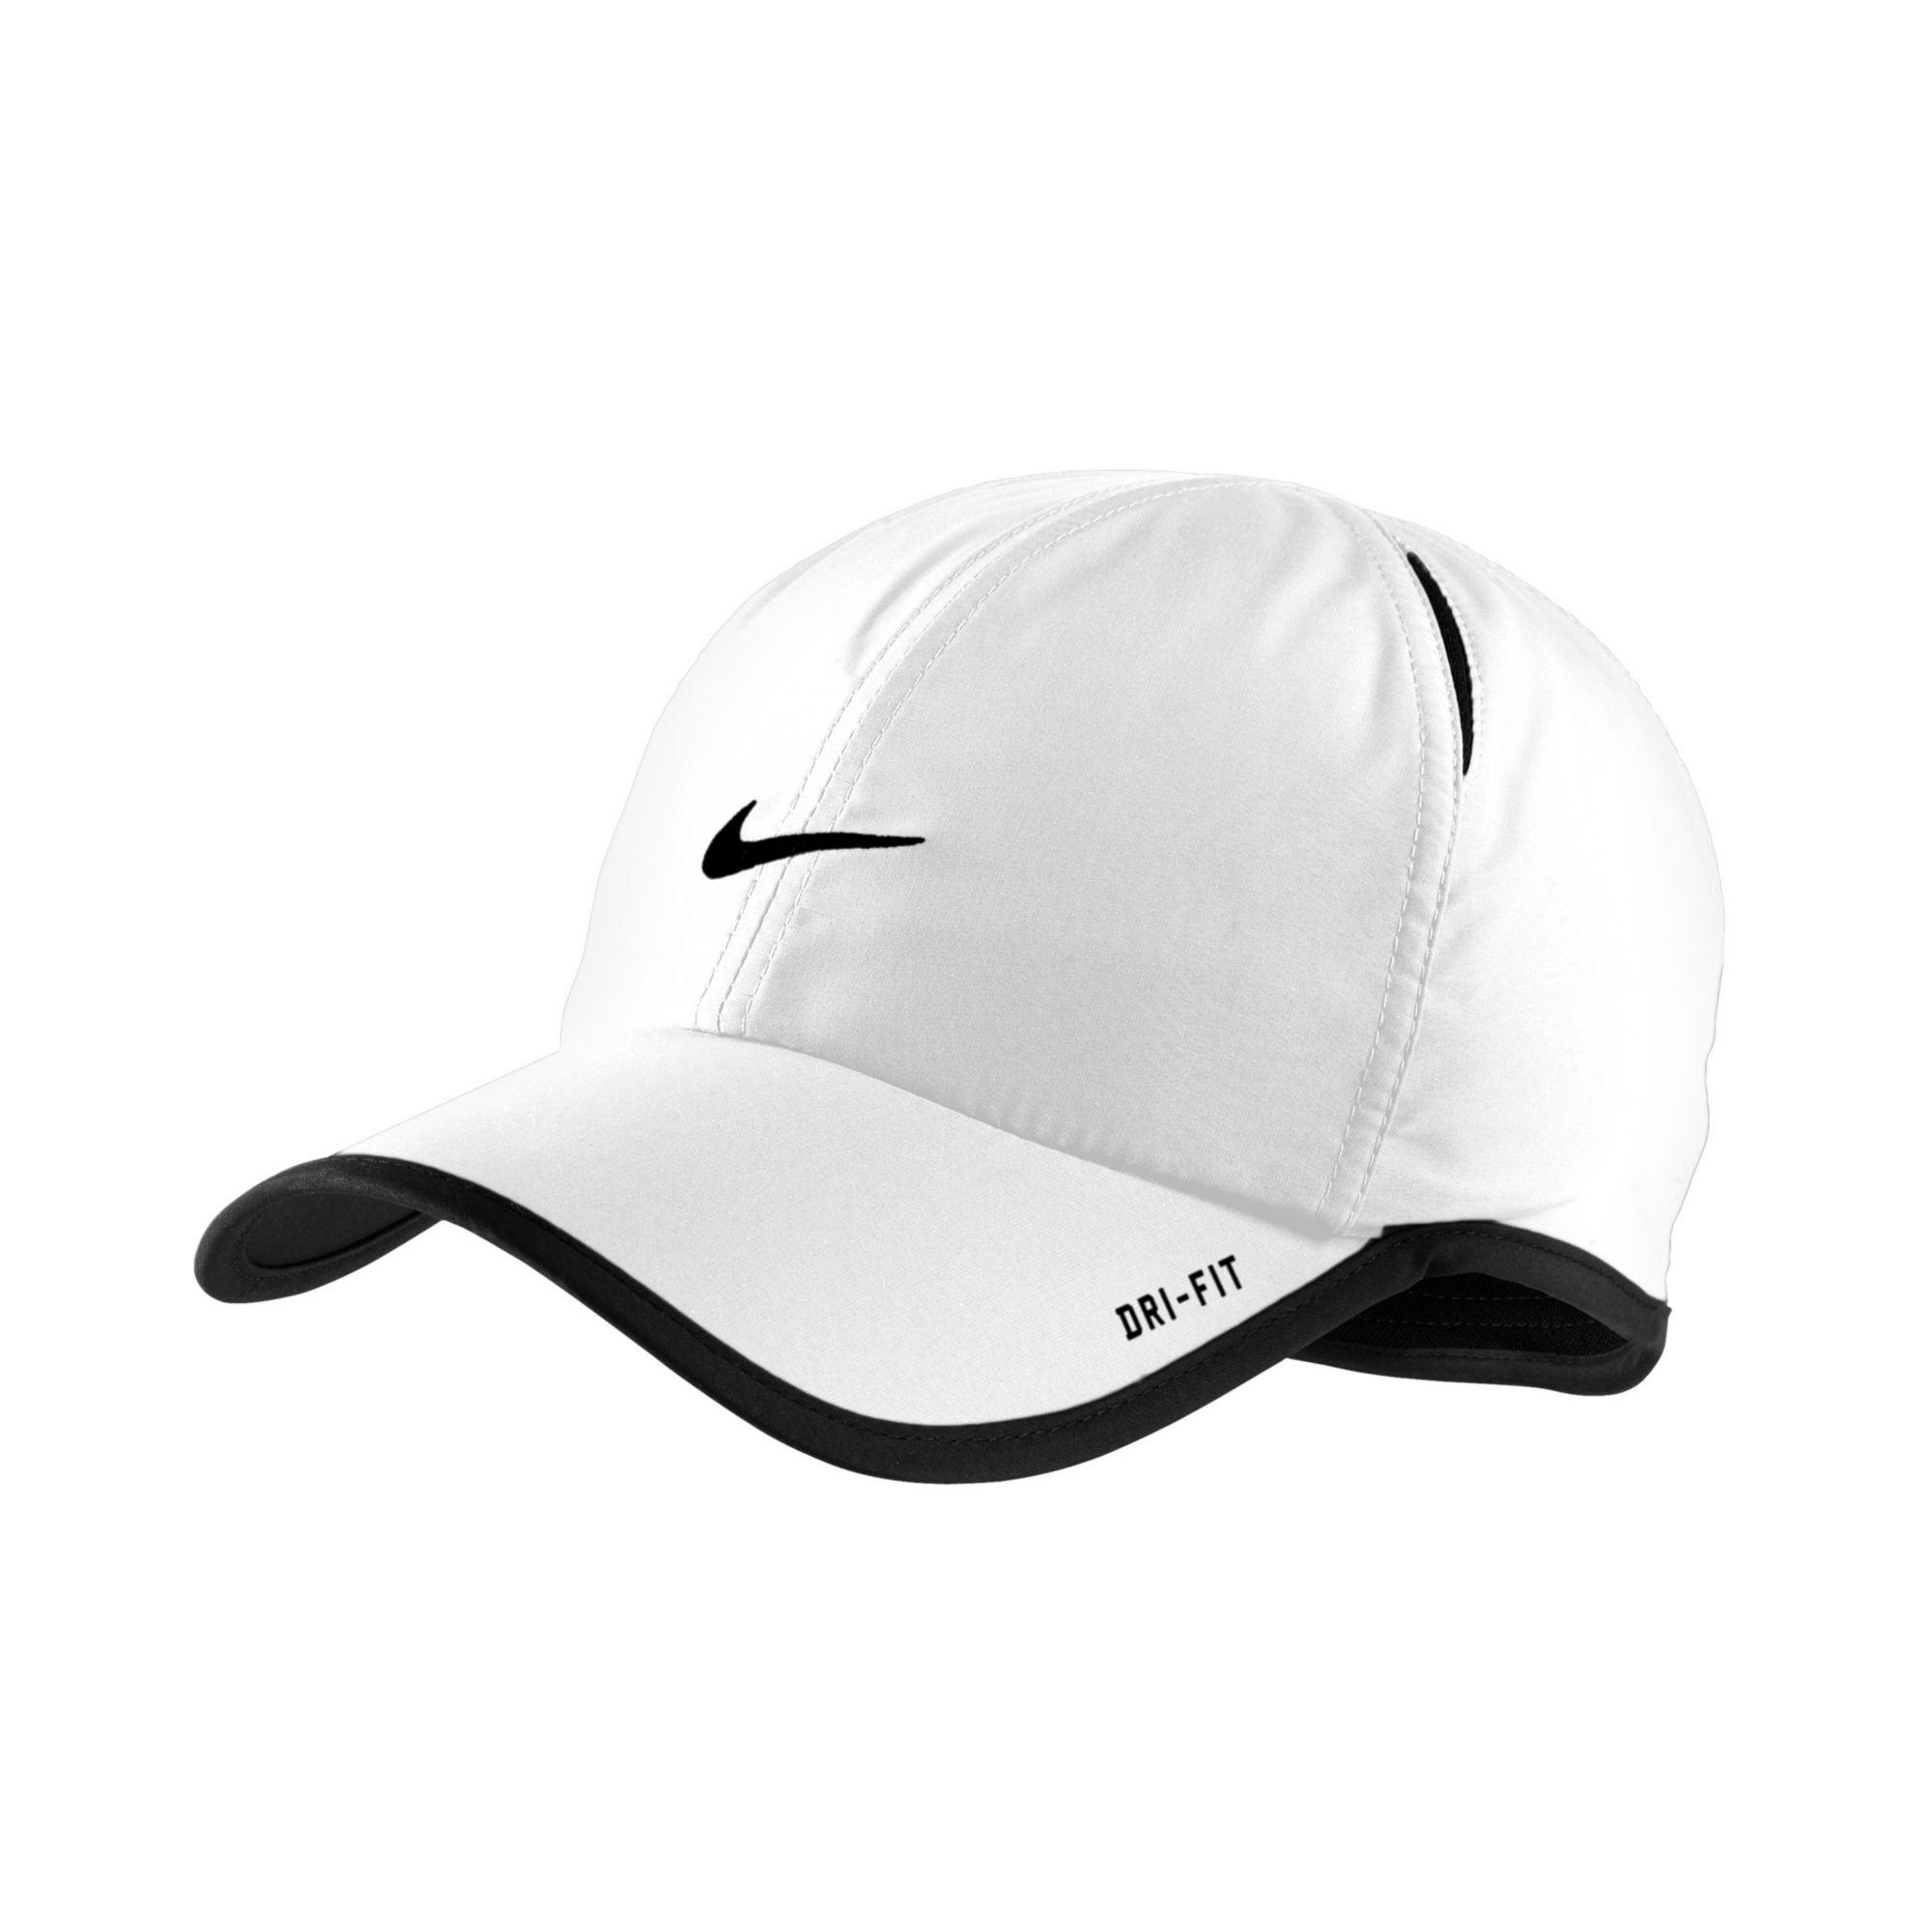 b4fd6e8bb5bb6 usa lyst nike dri fit feather light cap in black for men ea2b0 fec31